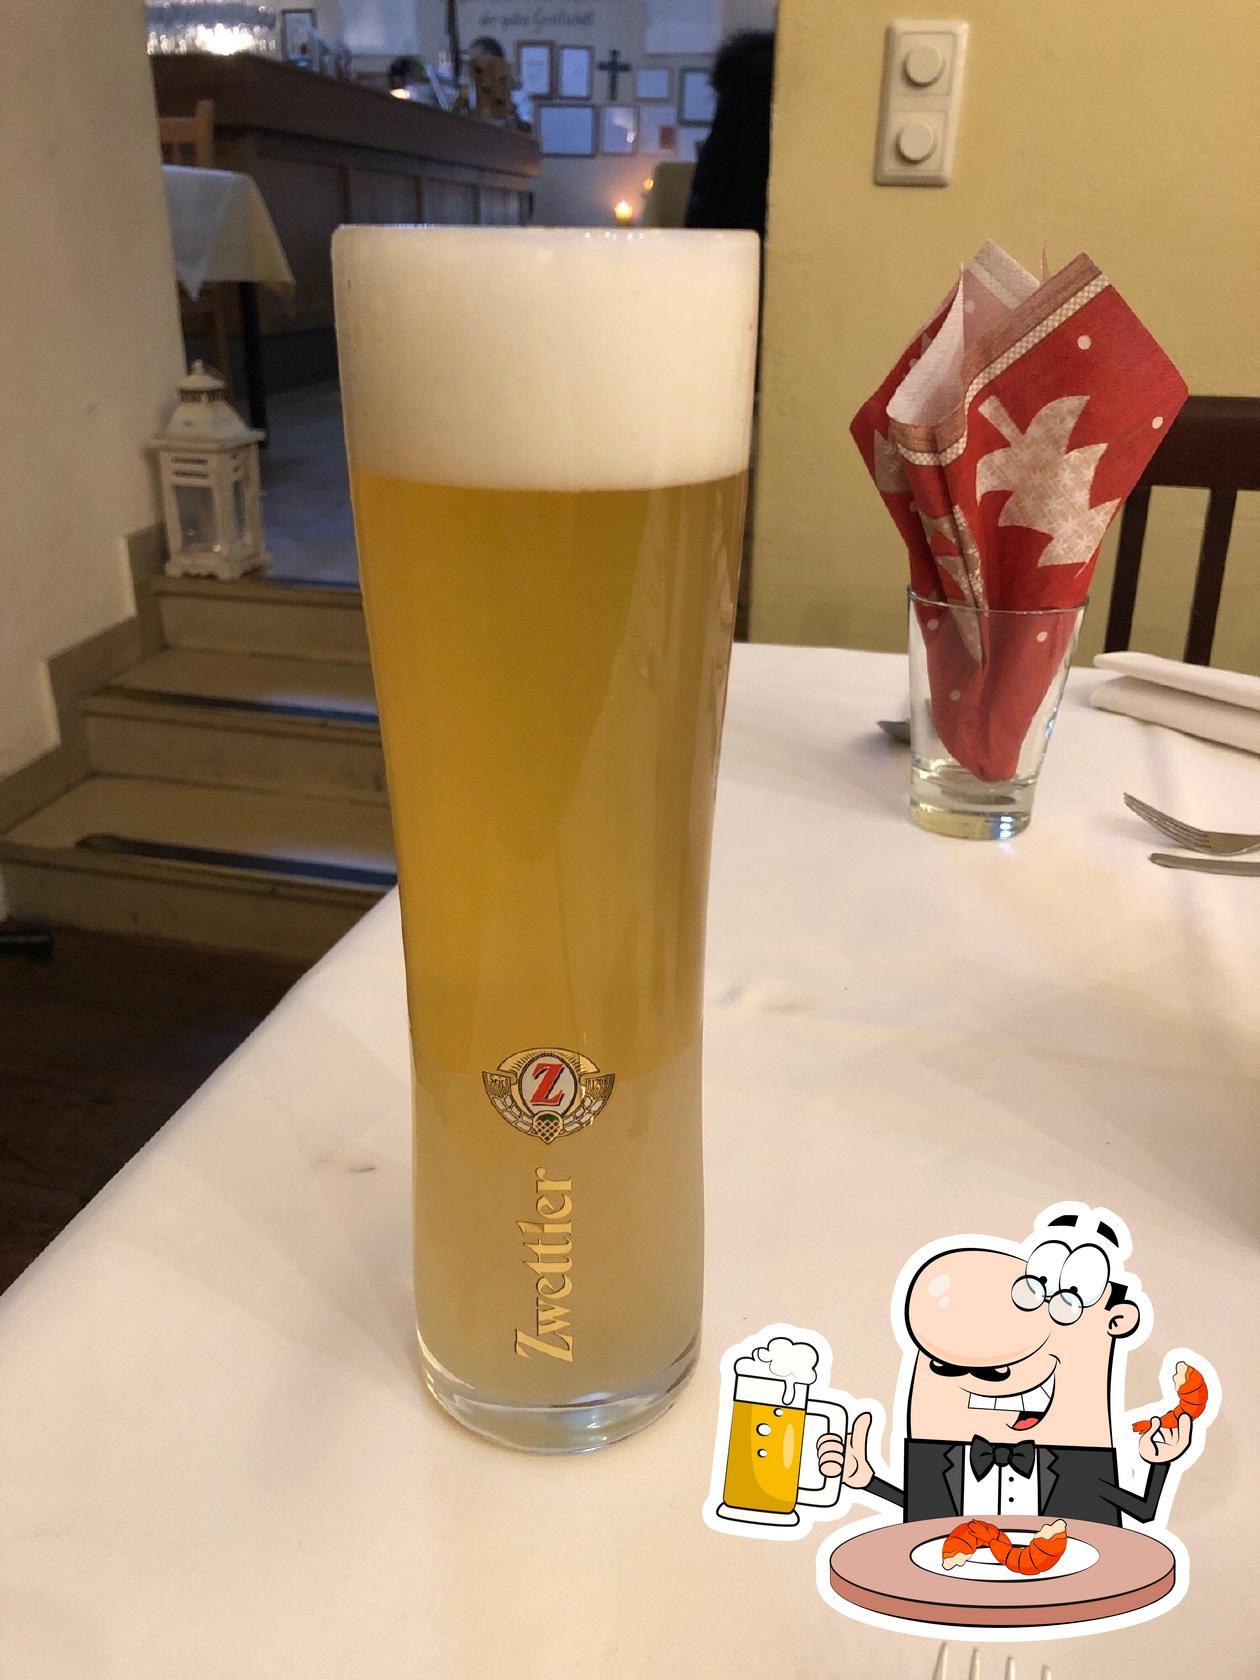 Bestellt ein kühles Bier am Ende des Tages